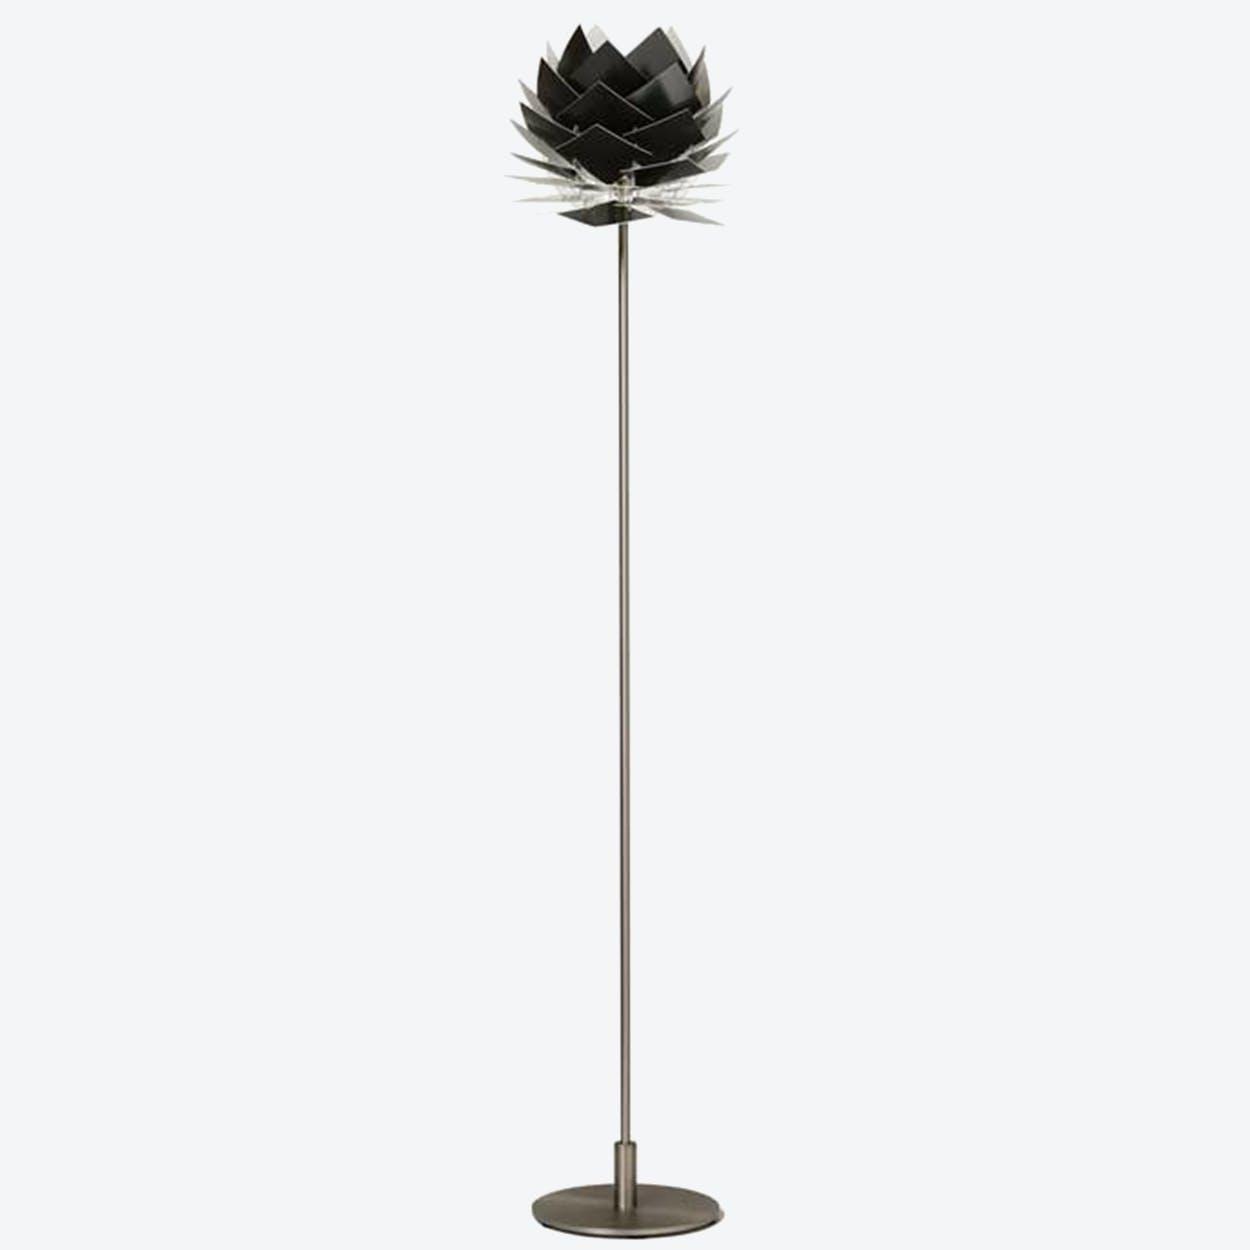 XS PineApple Floor Lamp in Black